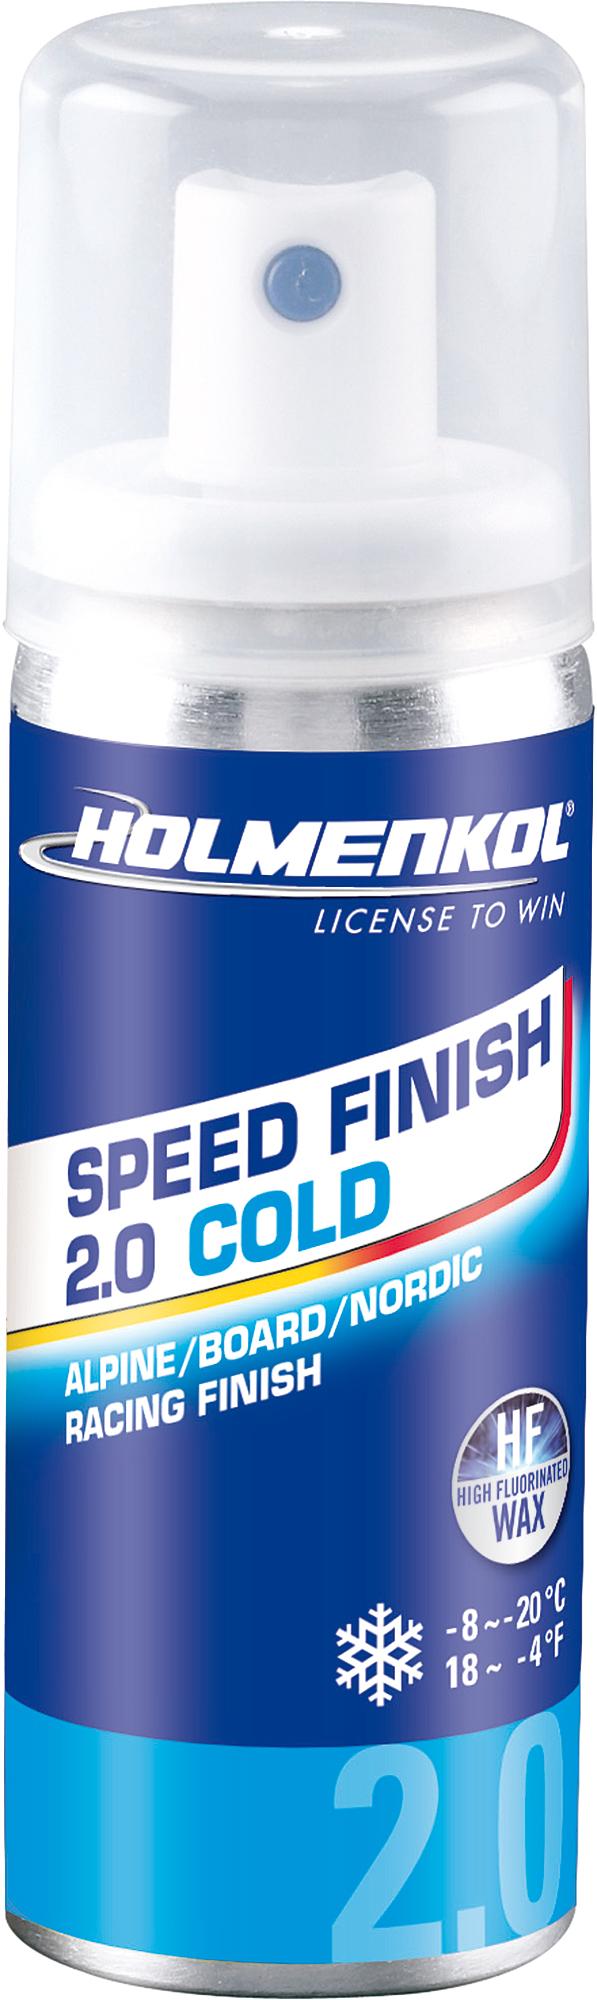 Holmenkol Эмульсия фторуглеродная для лыж и сноубордов HOLMENKOL Speed Finish2.0 COLD